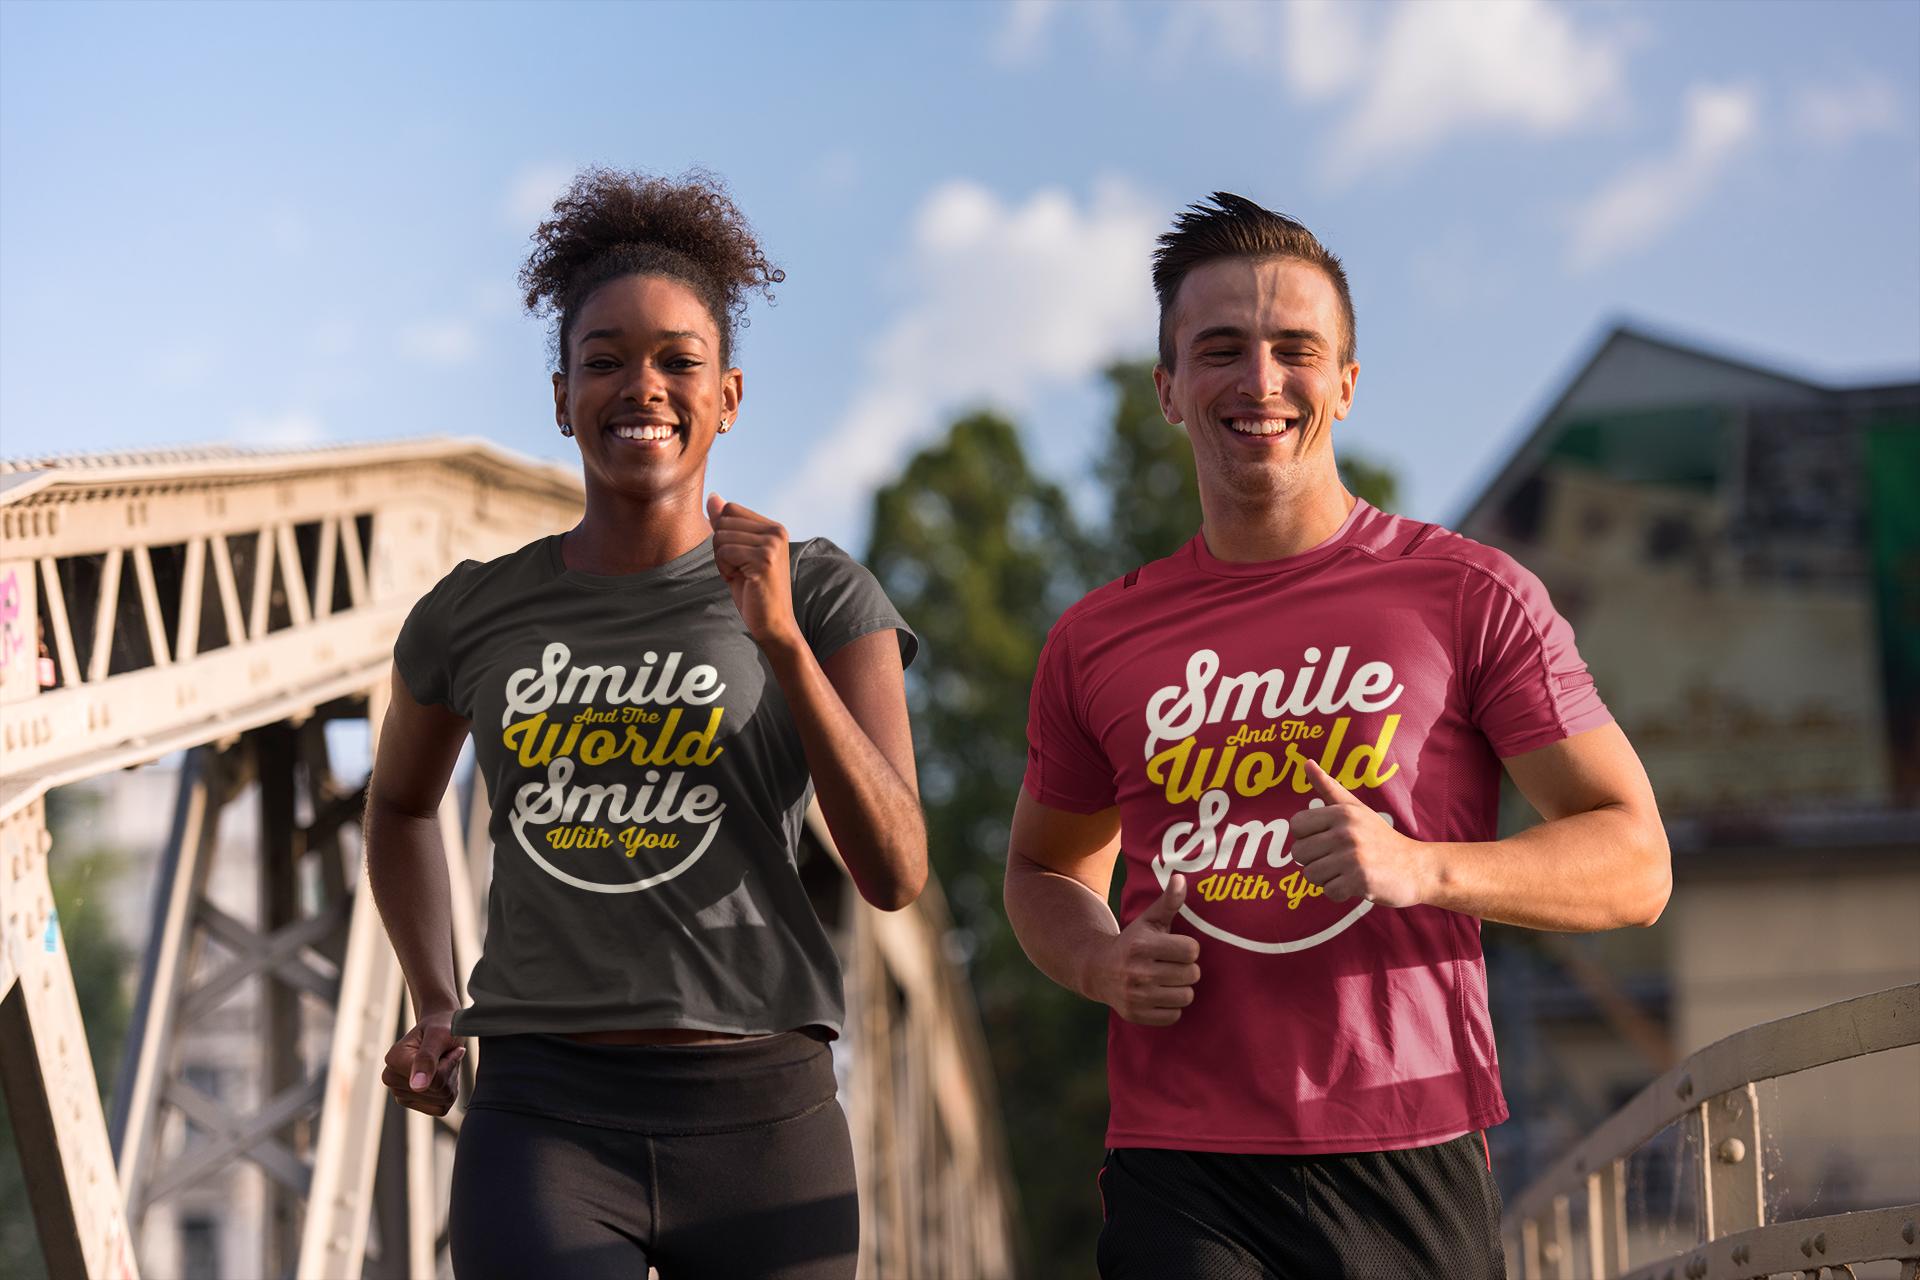 Camisetas sonriendo